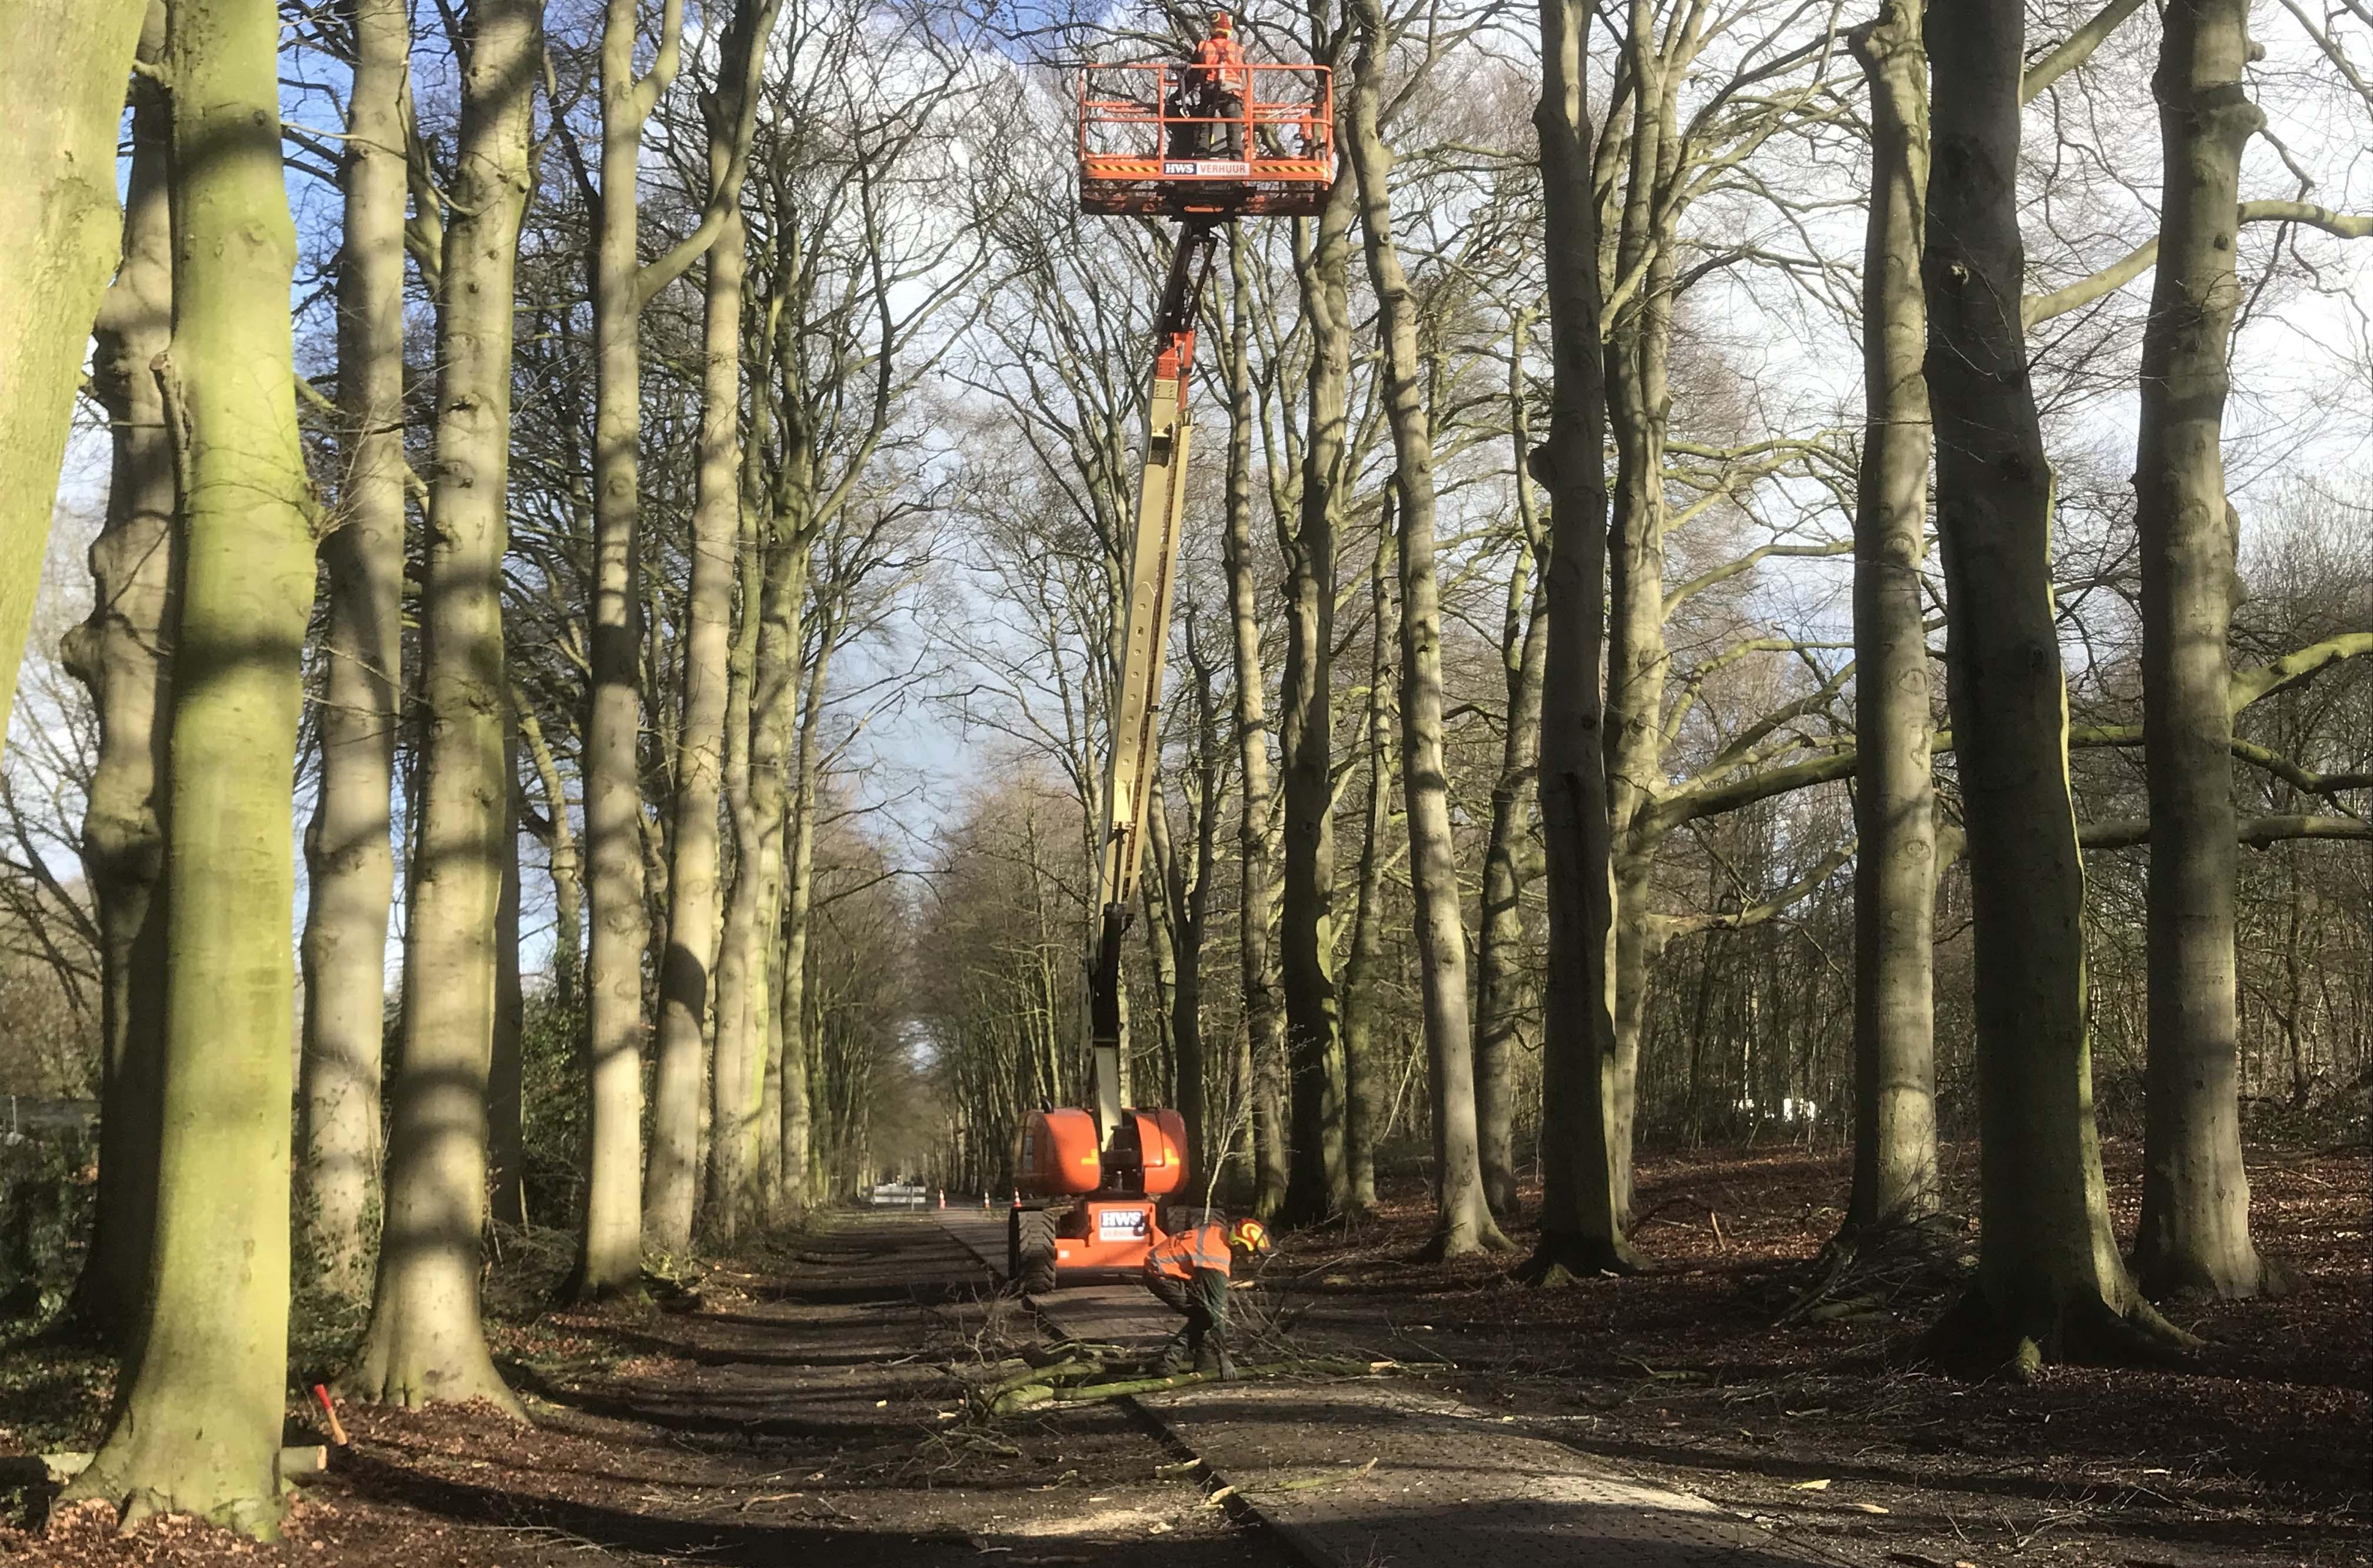 Hoefakker boomspecialisten snoeien monumentale beuken Geldersch Landschap (11m)